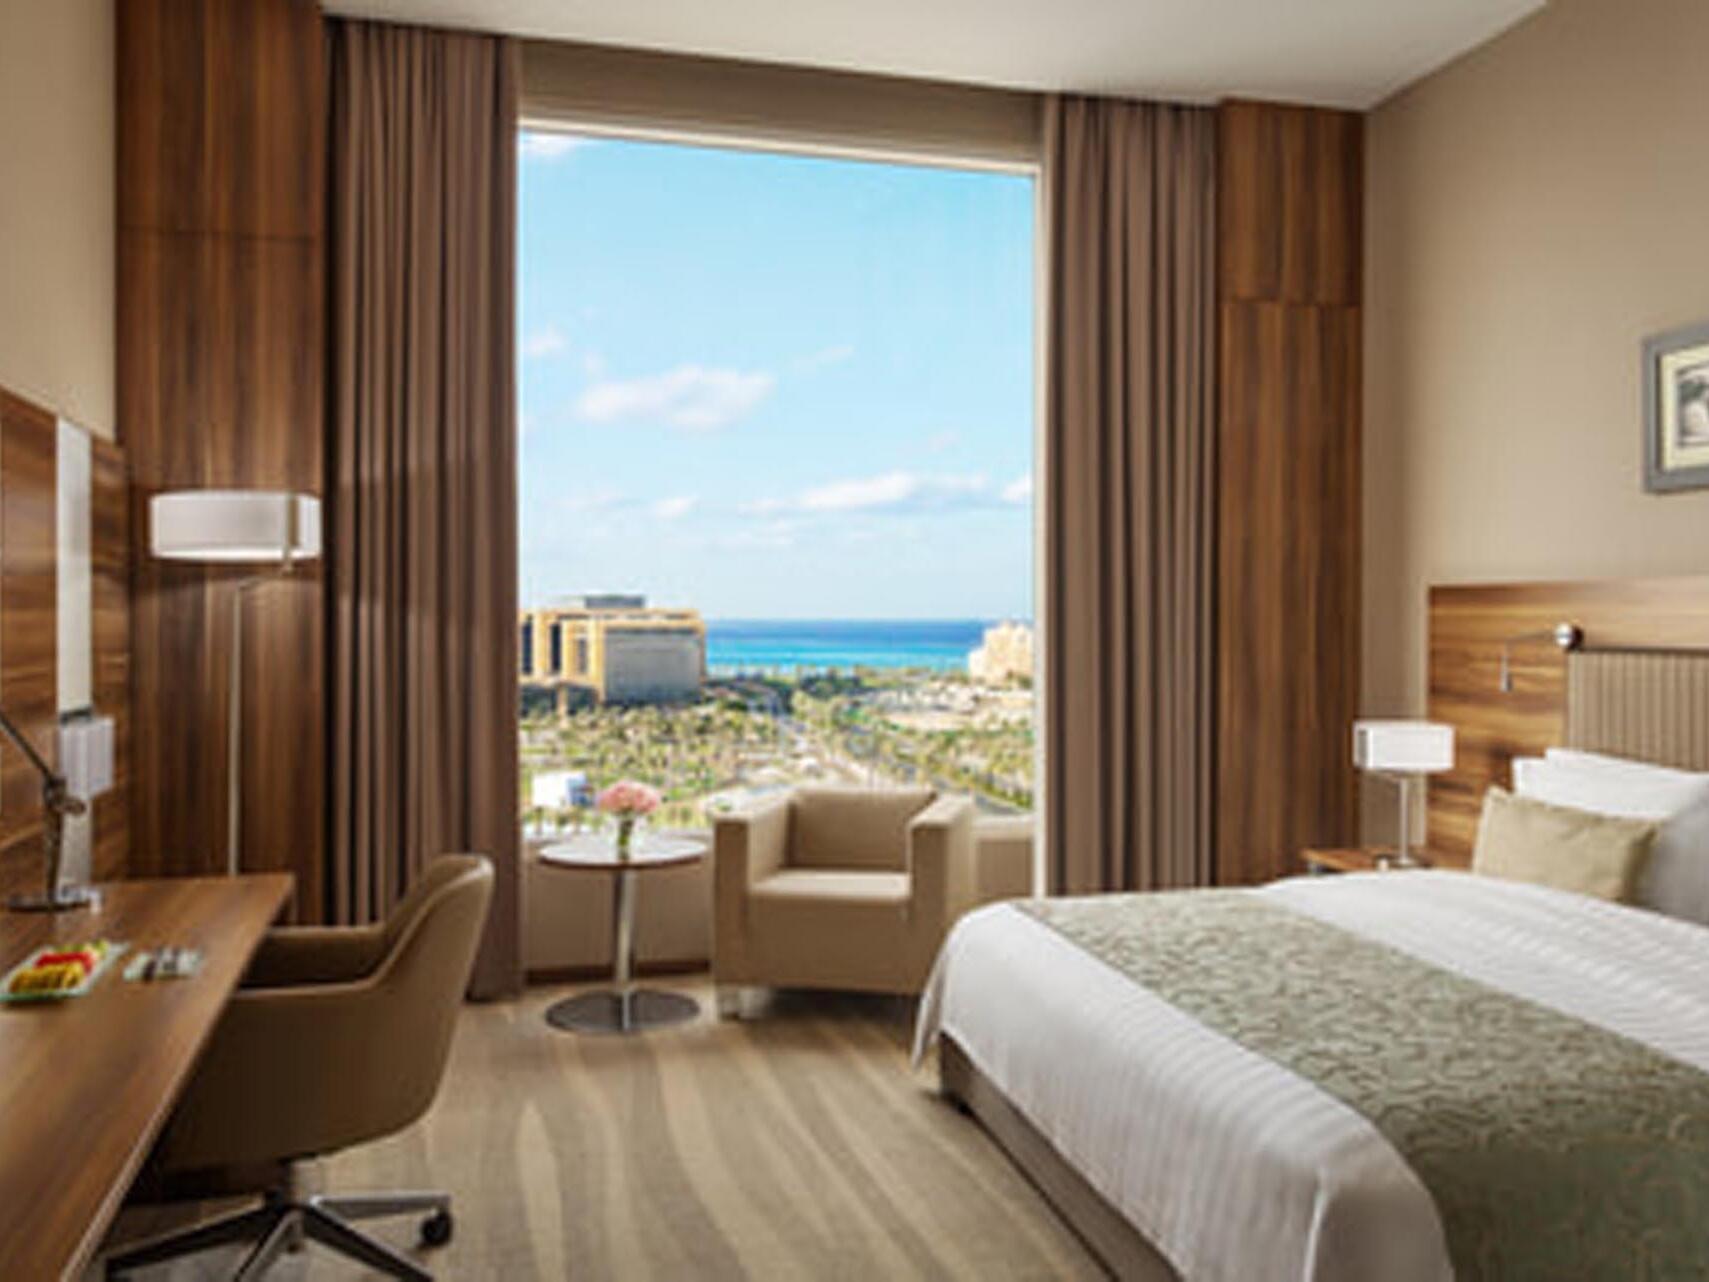 Superior Room Marina View with one bed at Bay La Sun Hotel & Marina